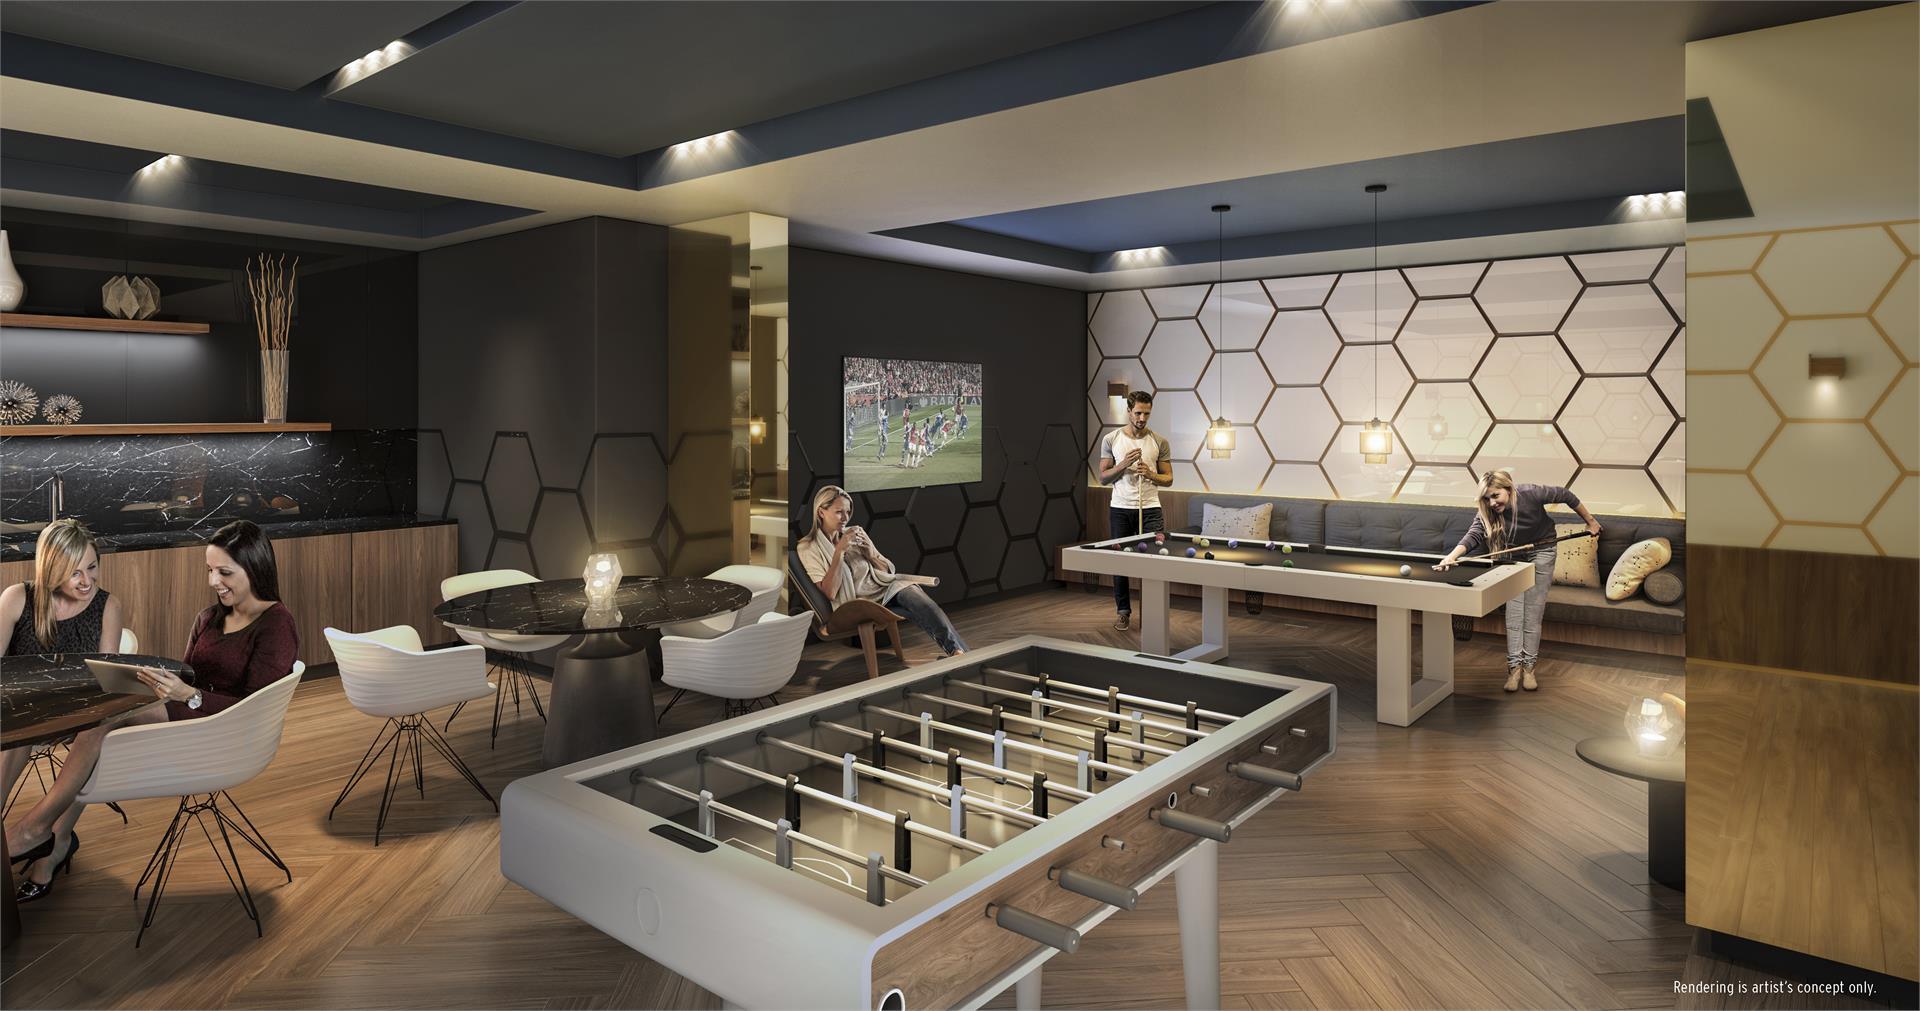 SuperSonic Condos Games Room, Toronto